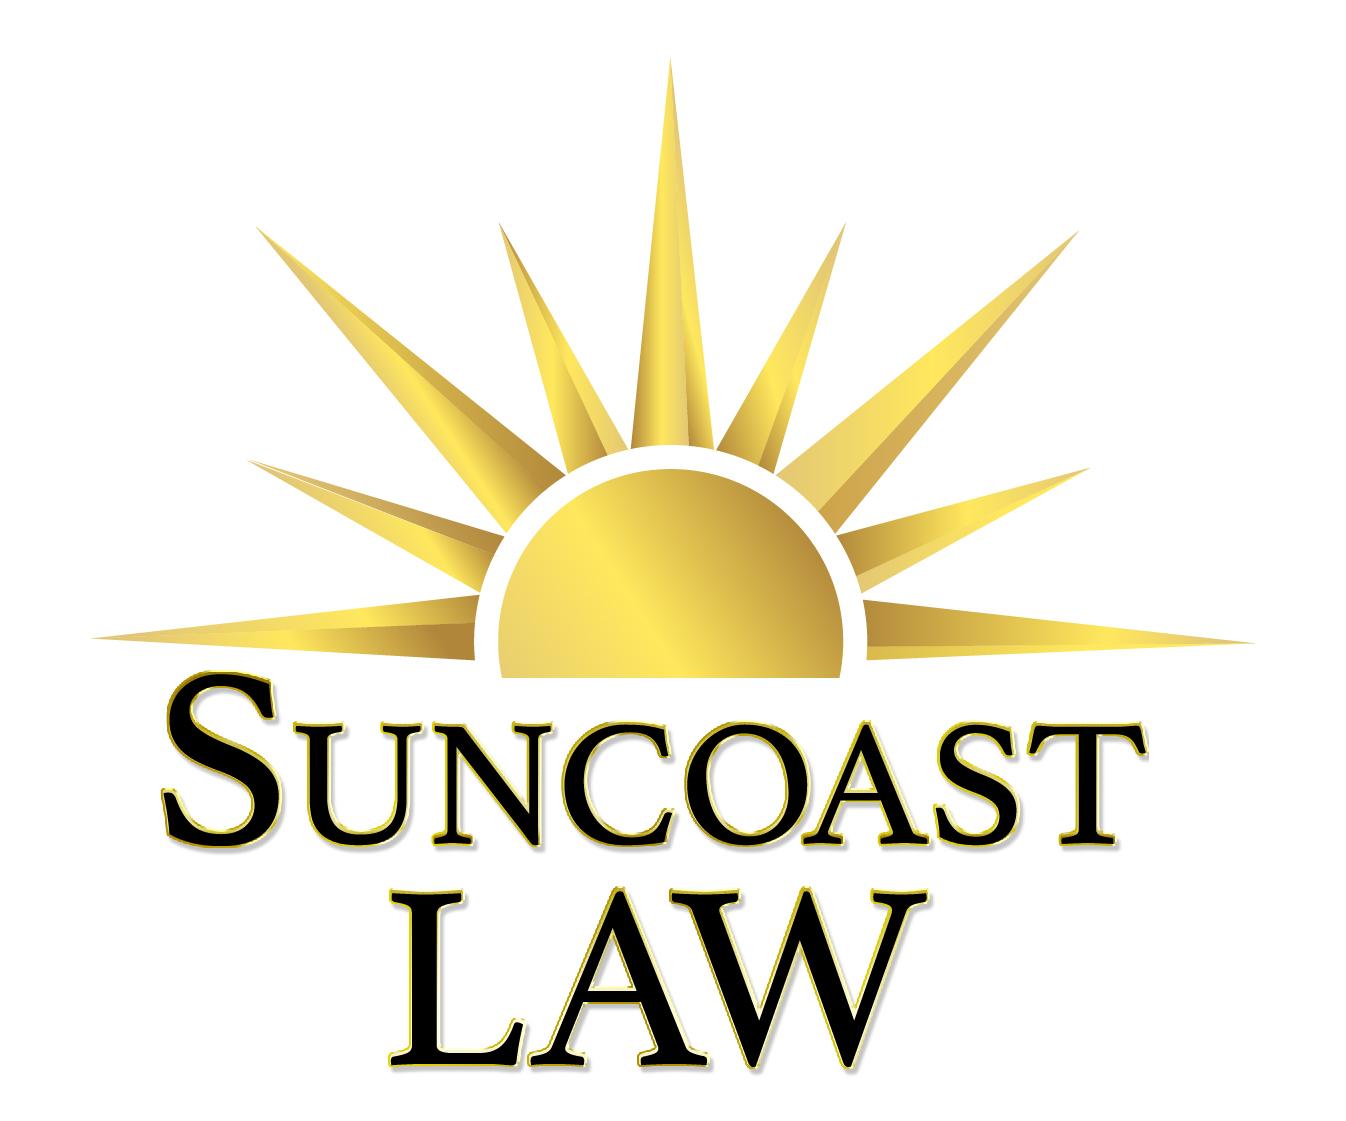 Sun Coast Law, LLP